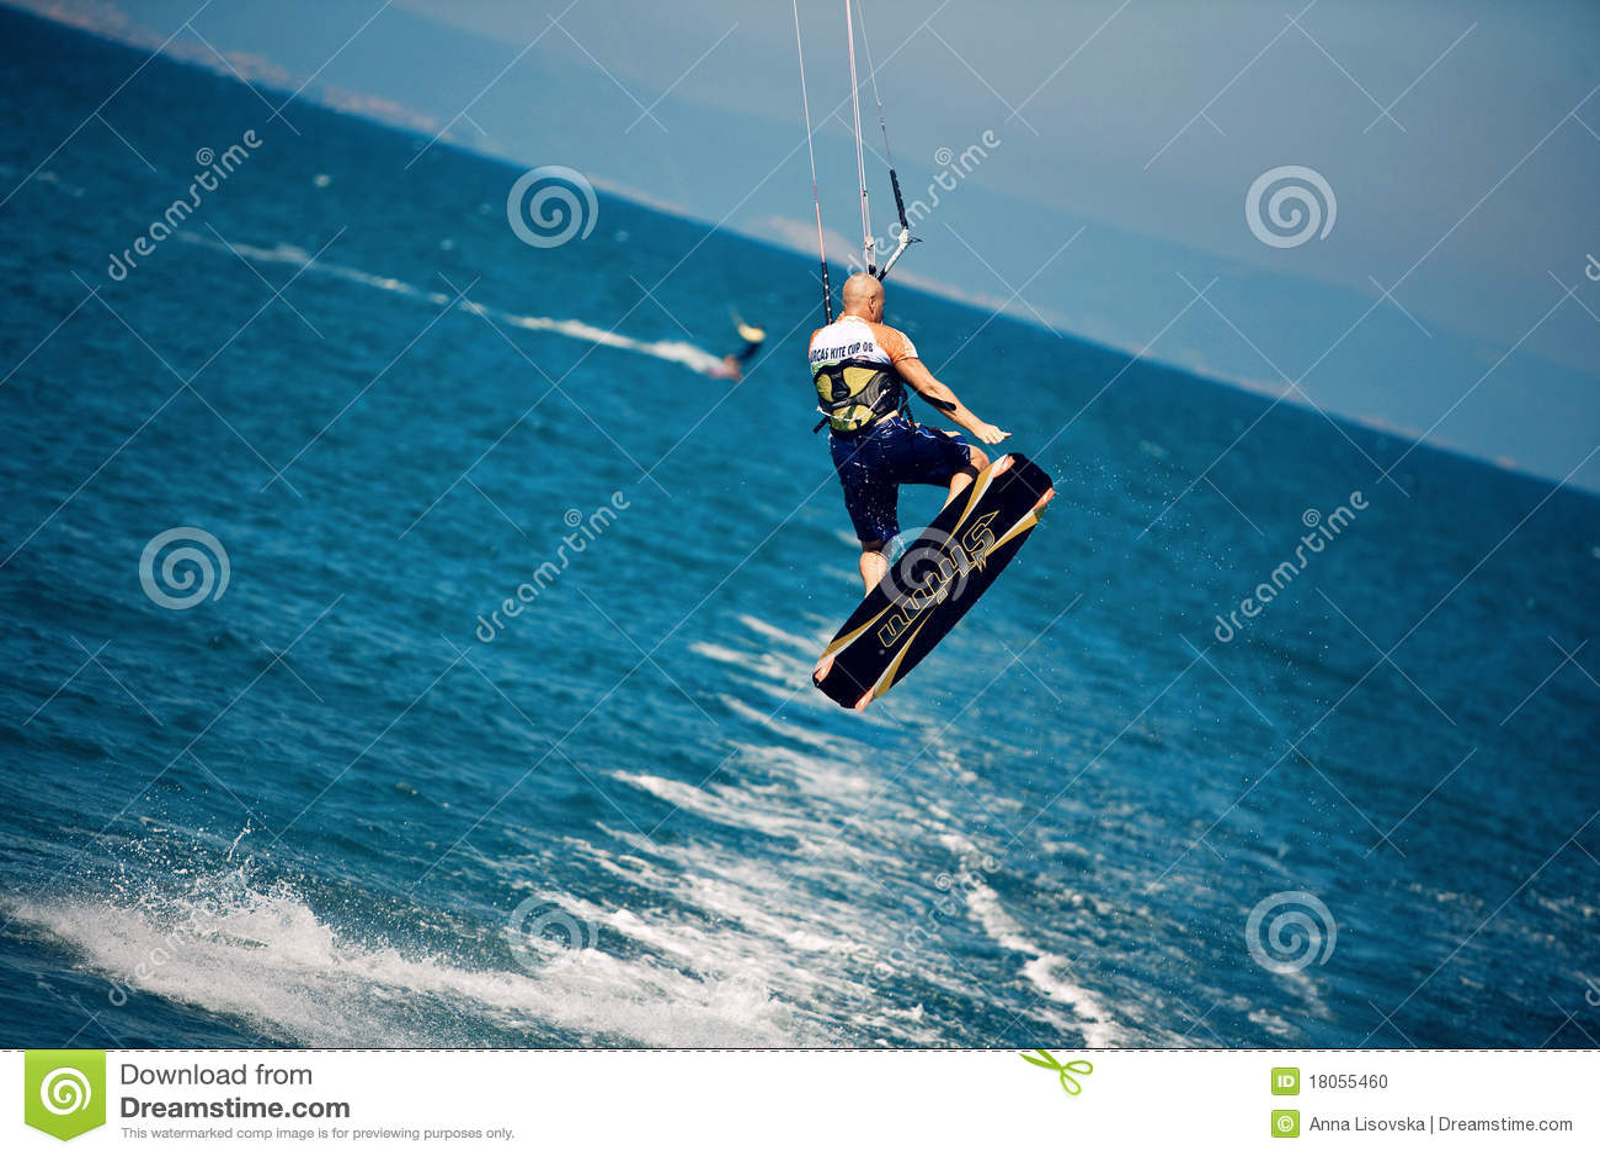 Kitesurfer in a jump